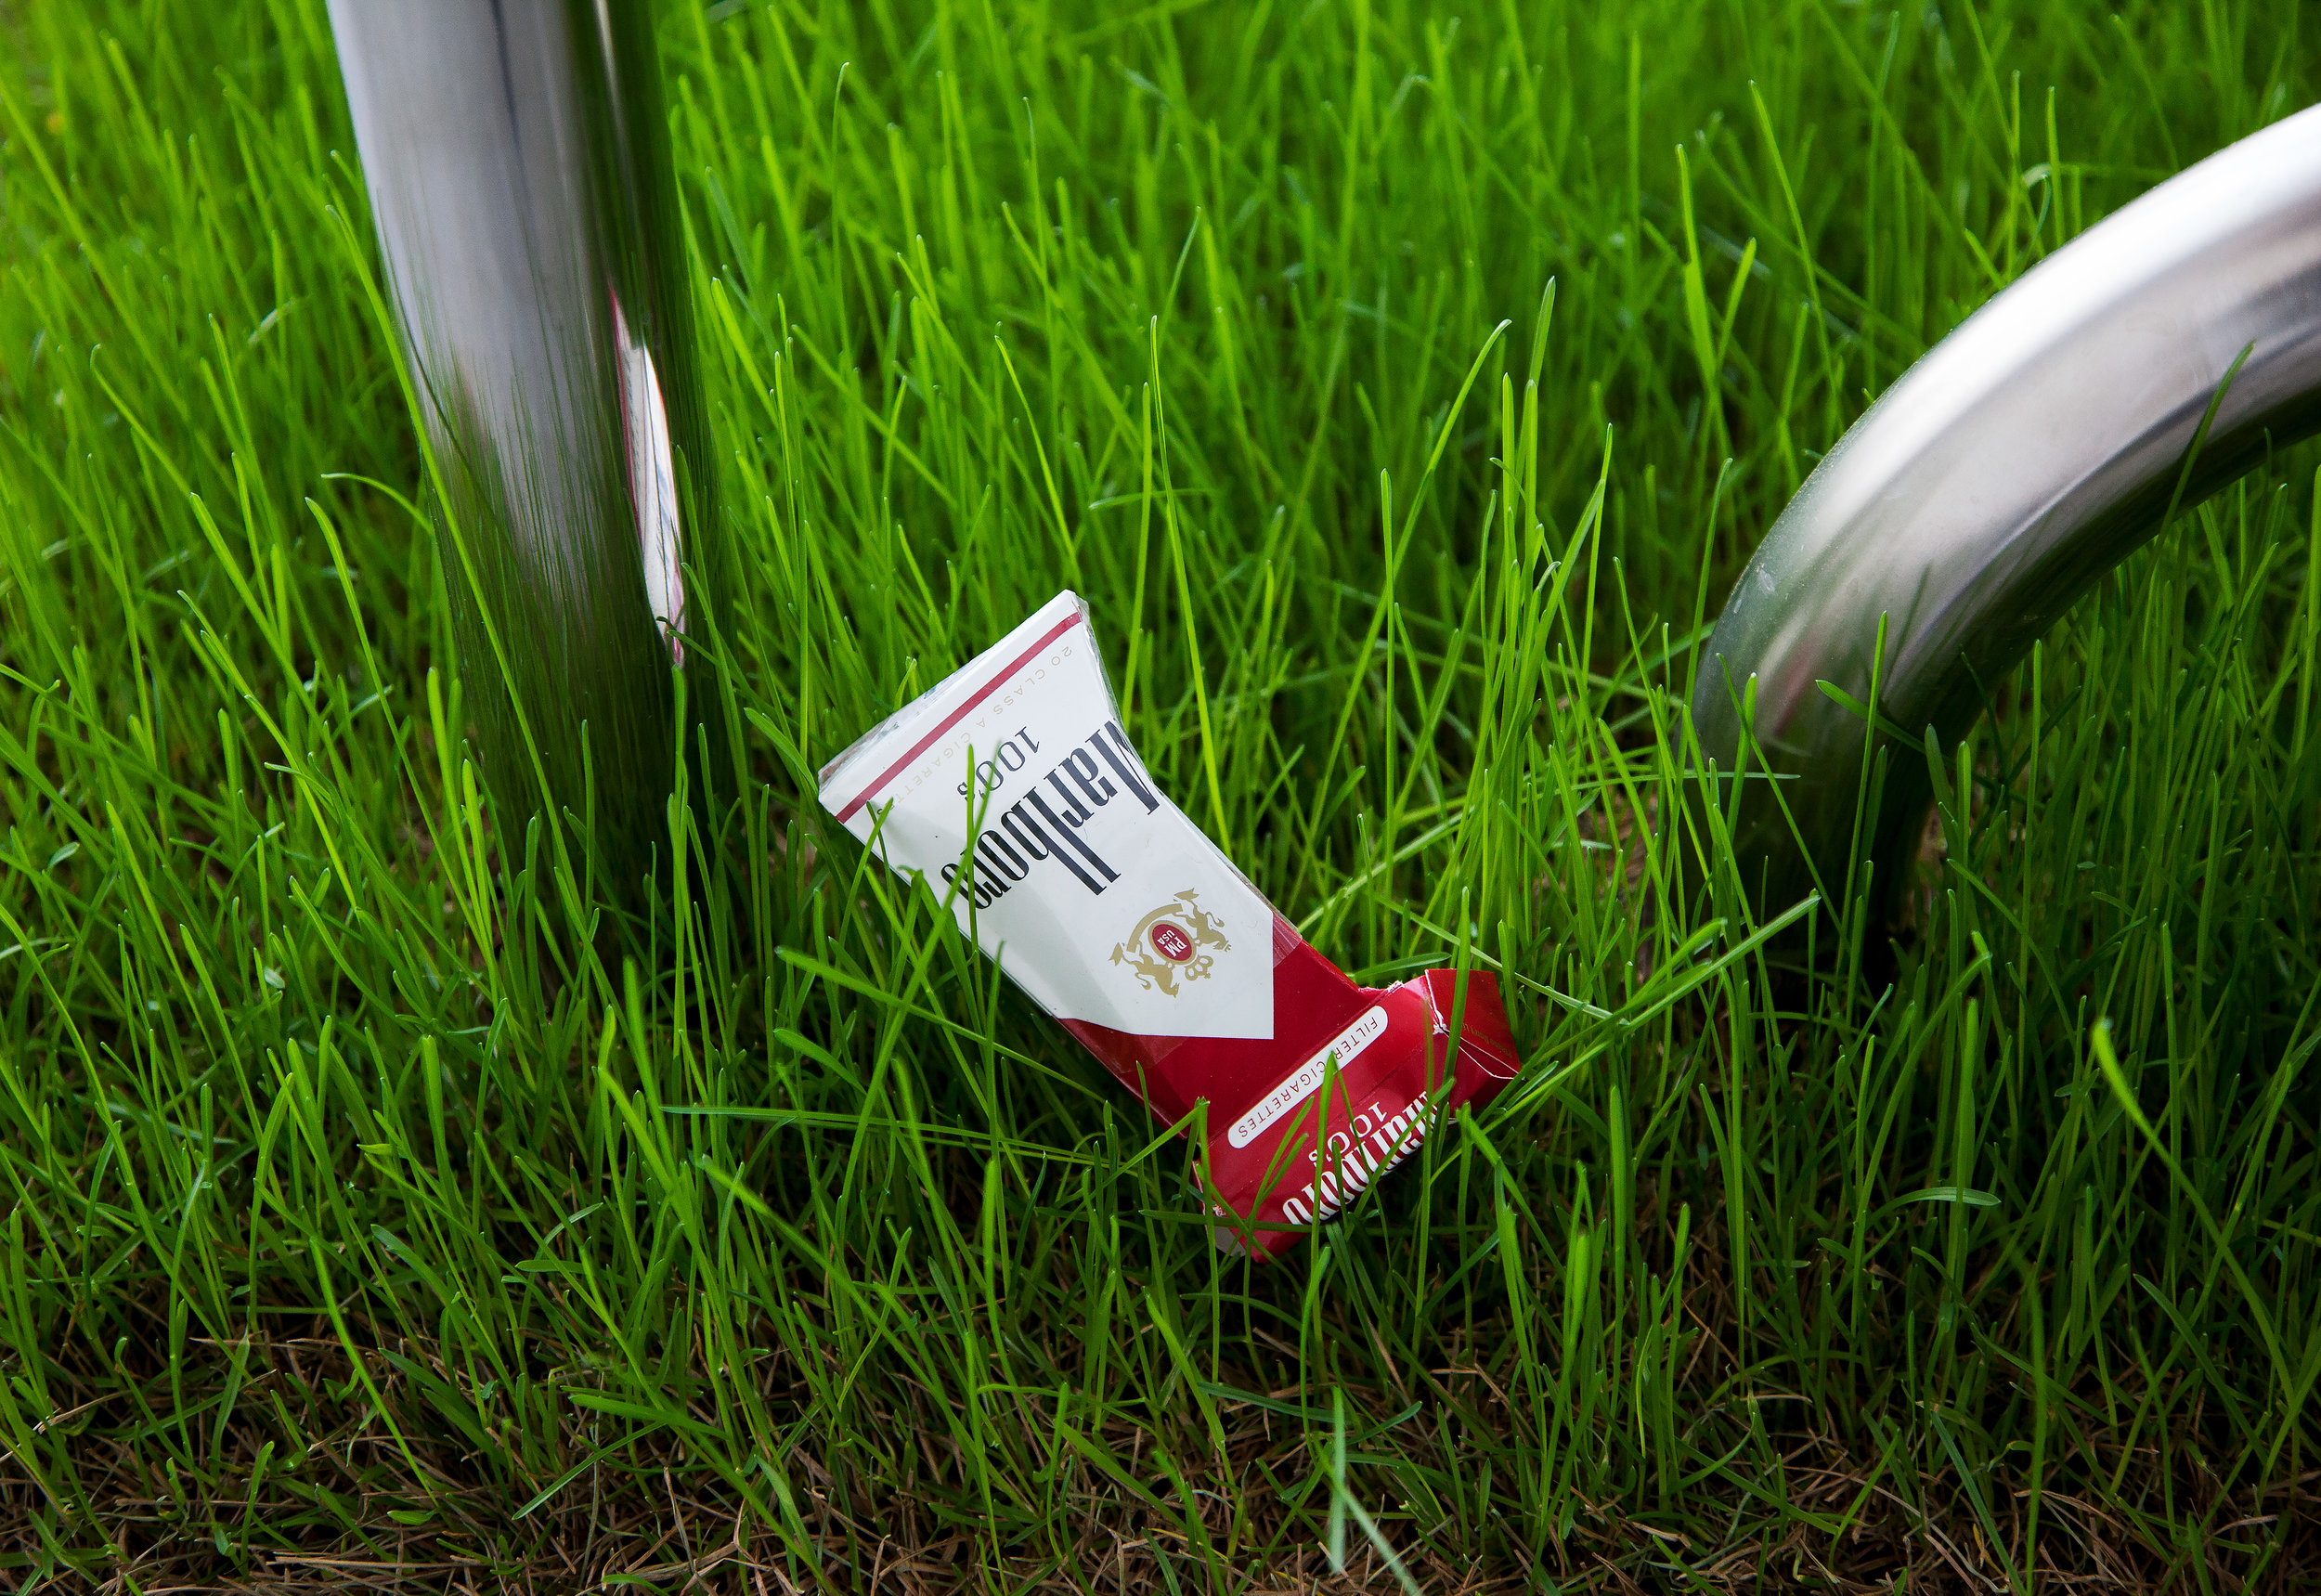 "Lawn Rails  ,  detail, 2014, stainless steel, grass, soil, wood base, one empty pack of Marlboro Reds 100's, 36""x 36"" x 36"" (91.4 cm x 91.4 cm x 91.4 cm)"